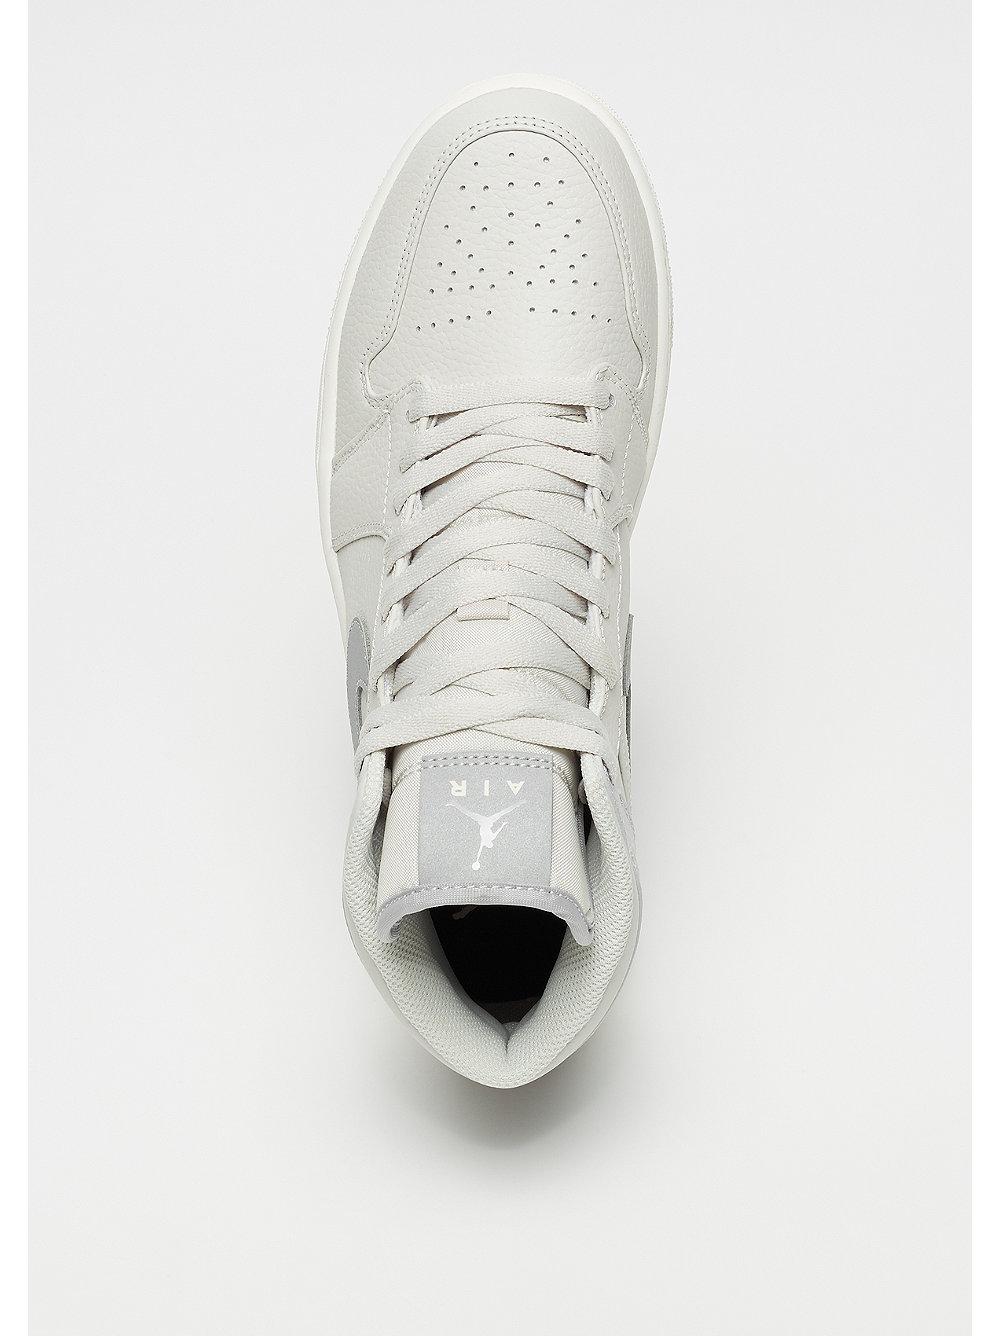 556bc933e60 Zapatillas Jordan Air Jordan 1 mid white en SNIPES